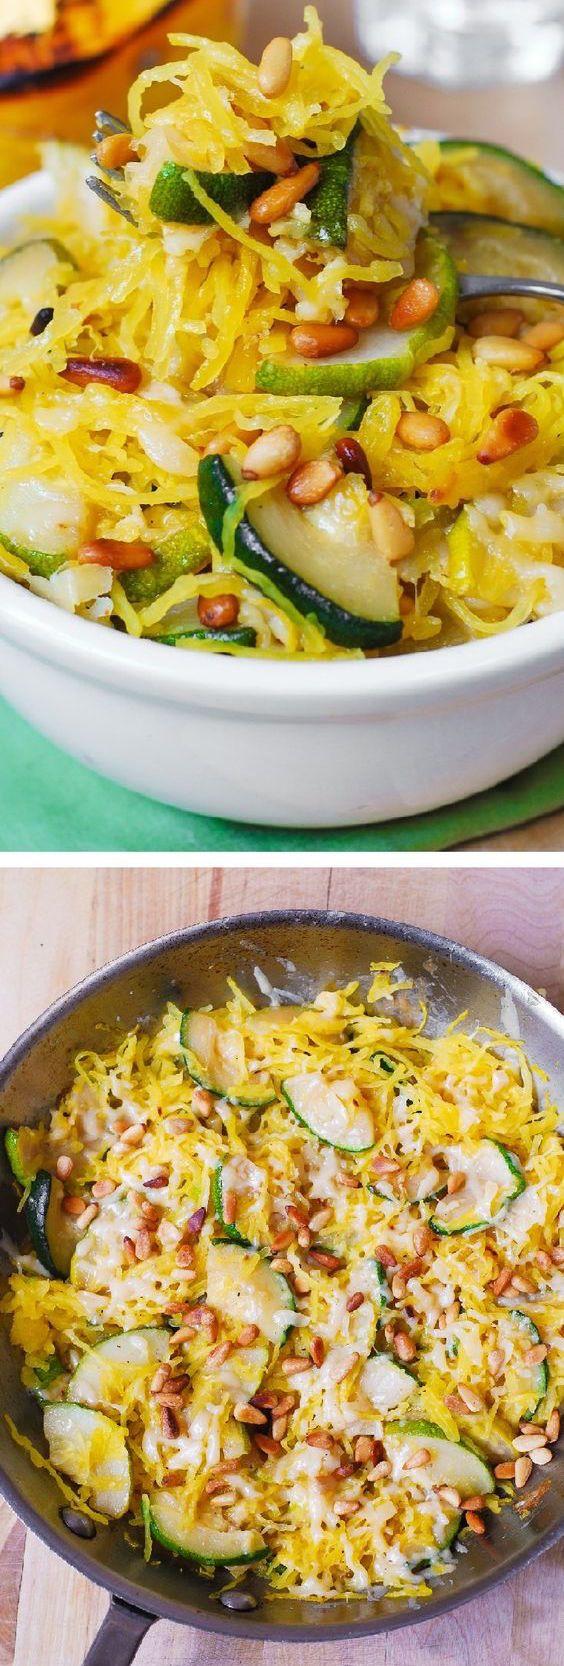 Parmesan Zucchini & Spaghetti Squash with Pine Nuts #healthy #holidays